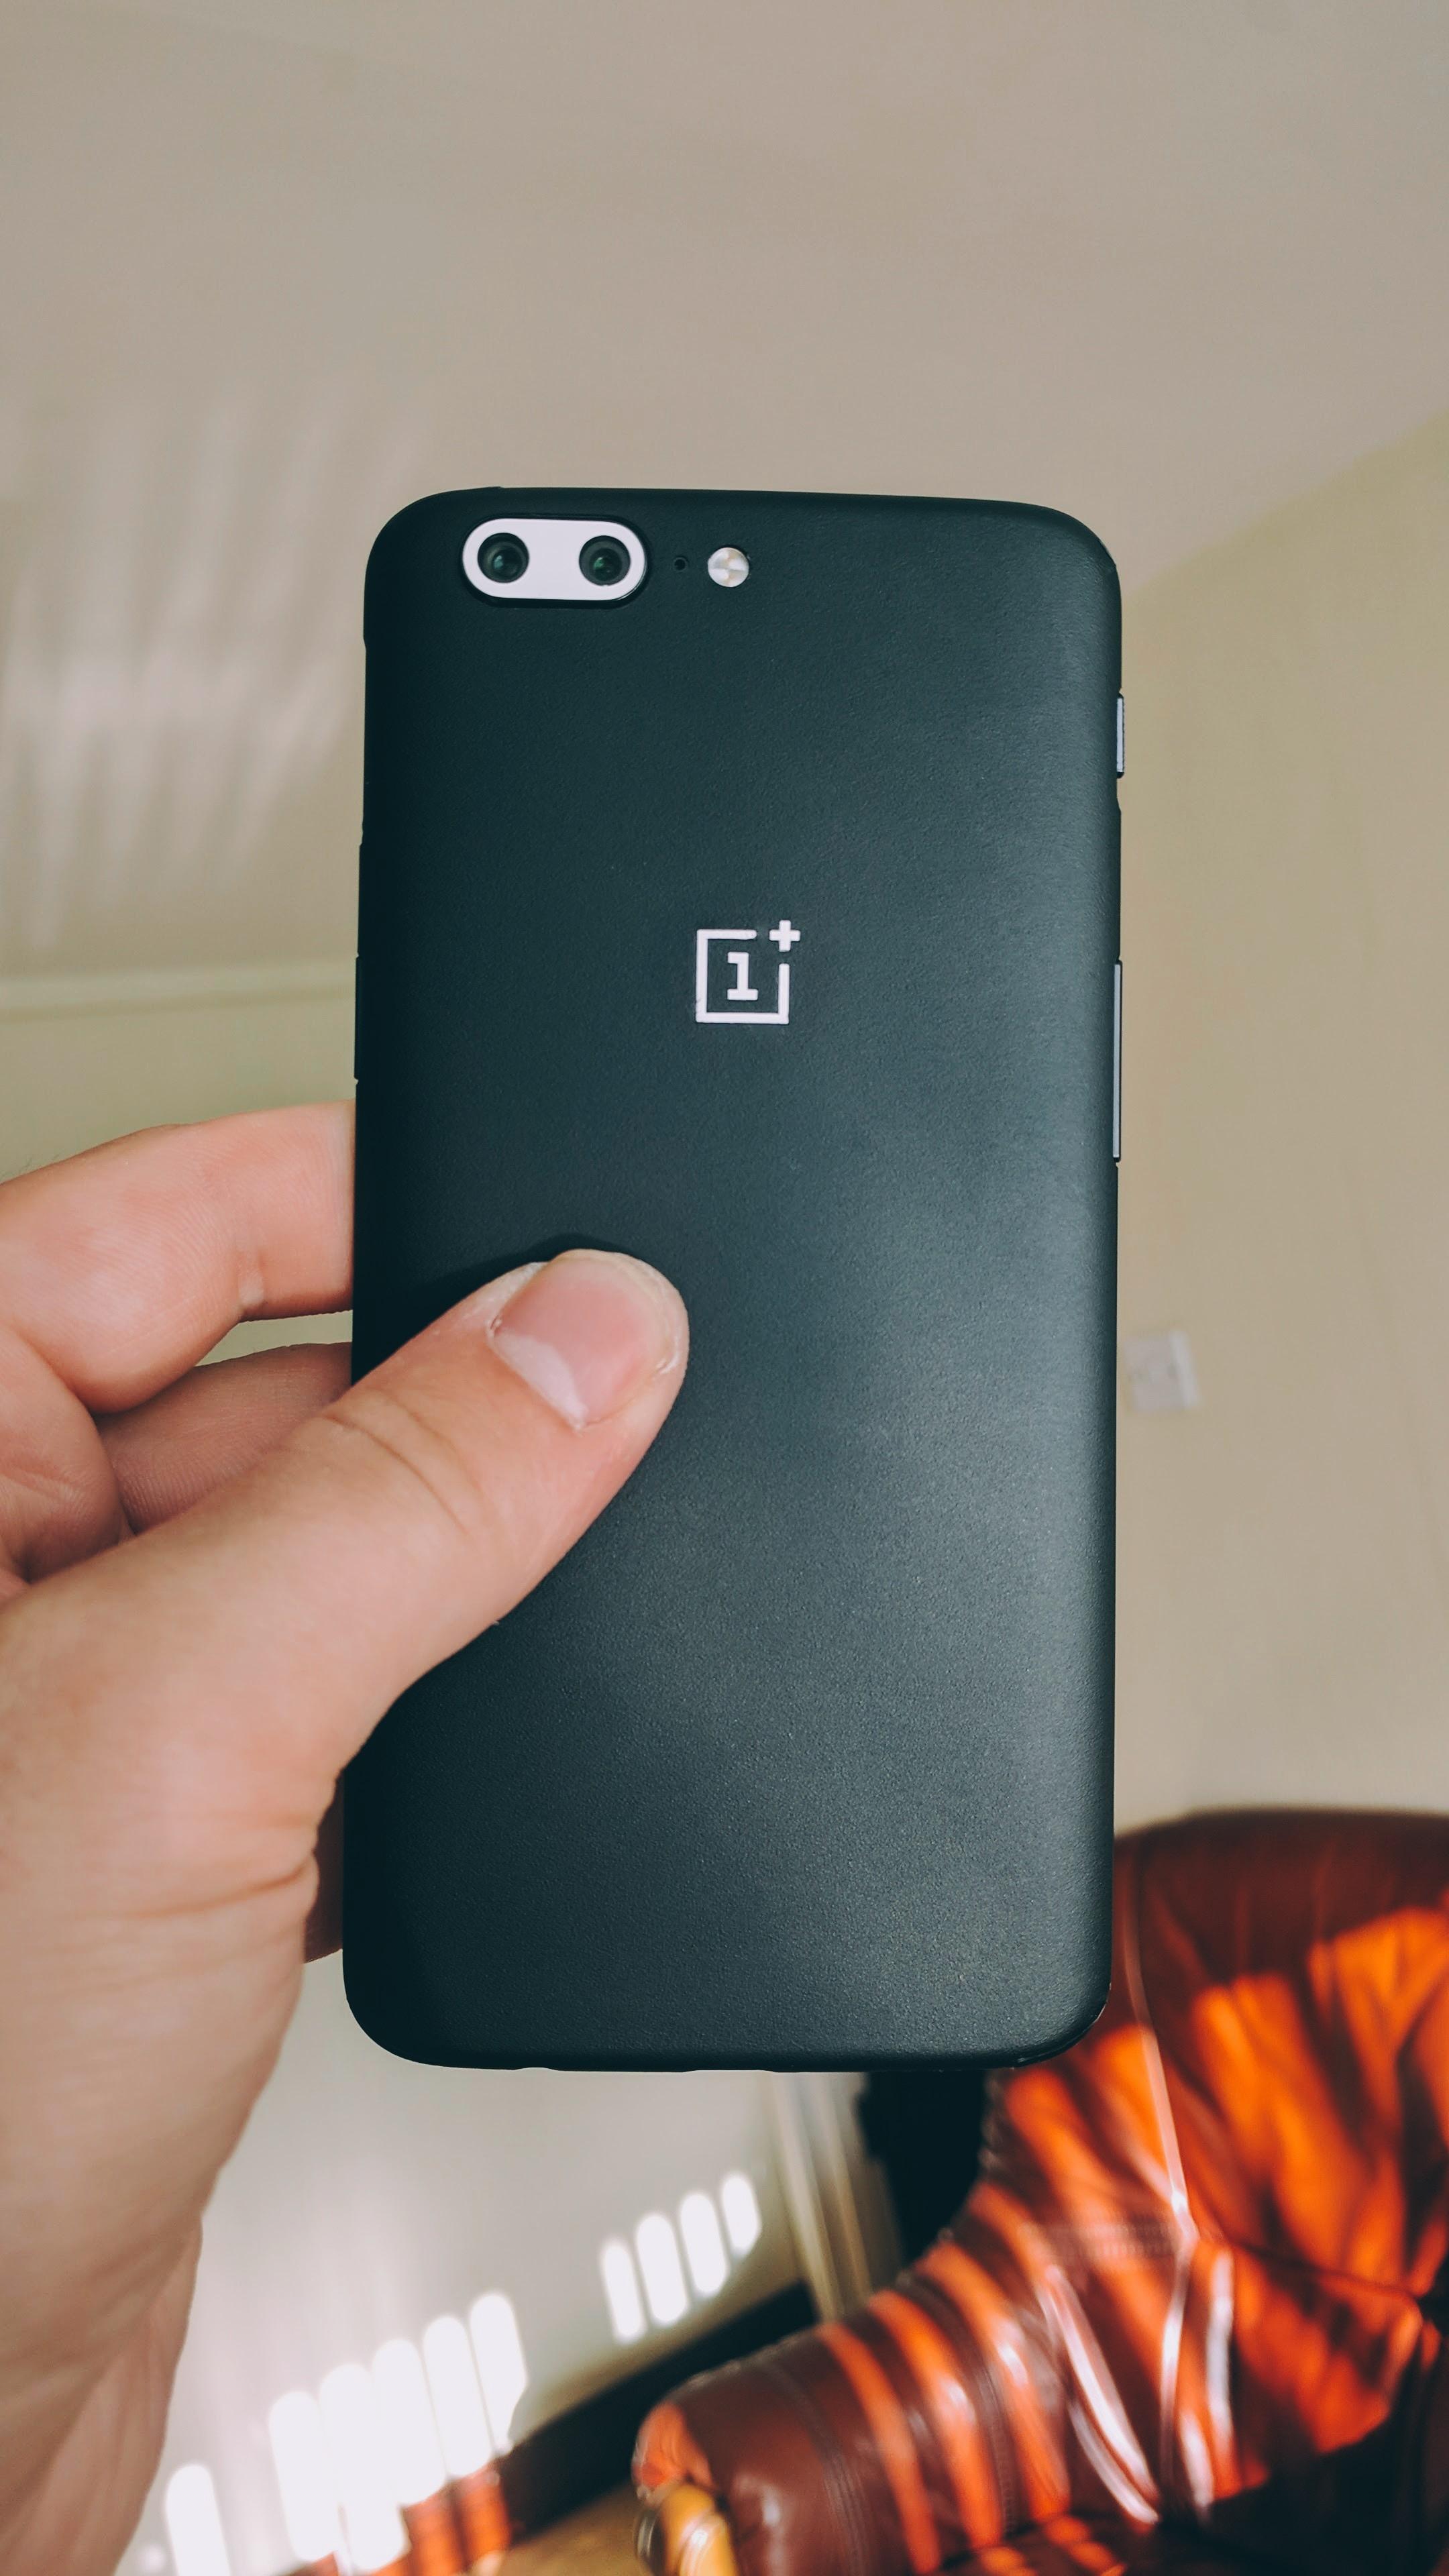 Holding a black smartphone.